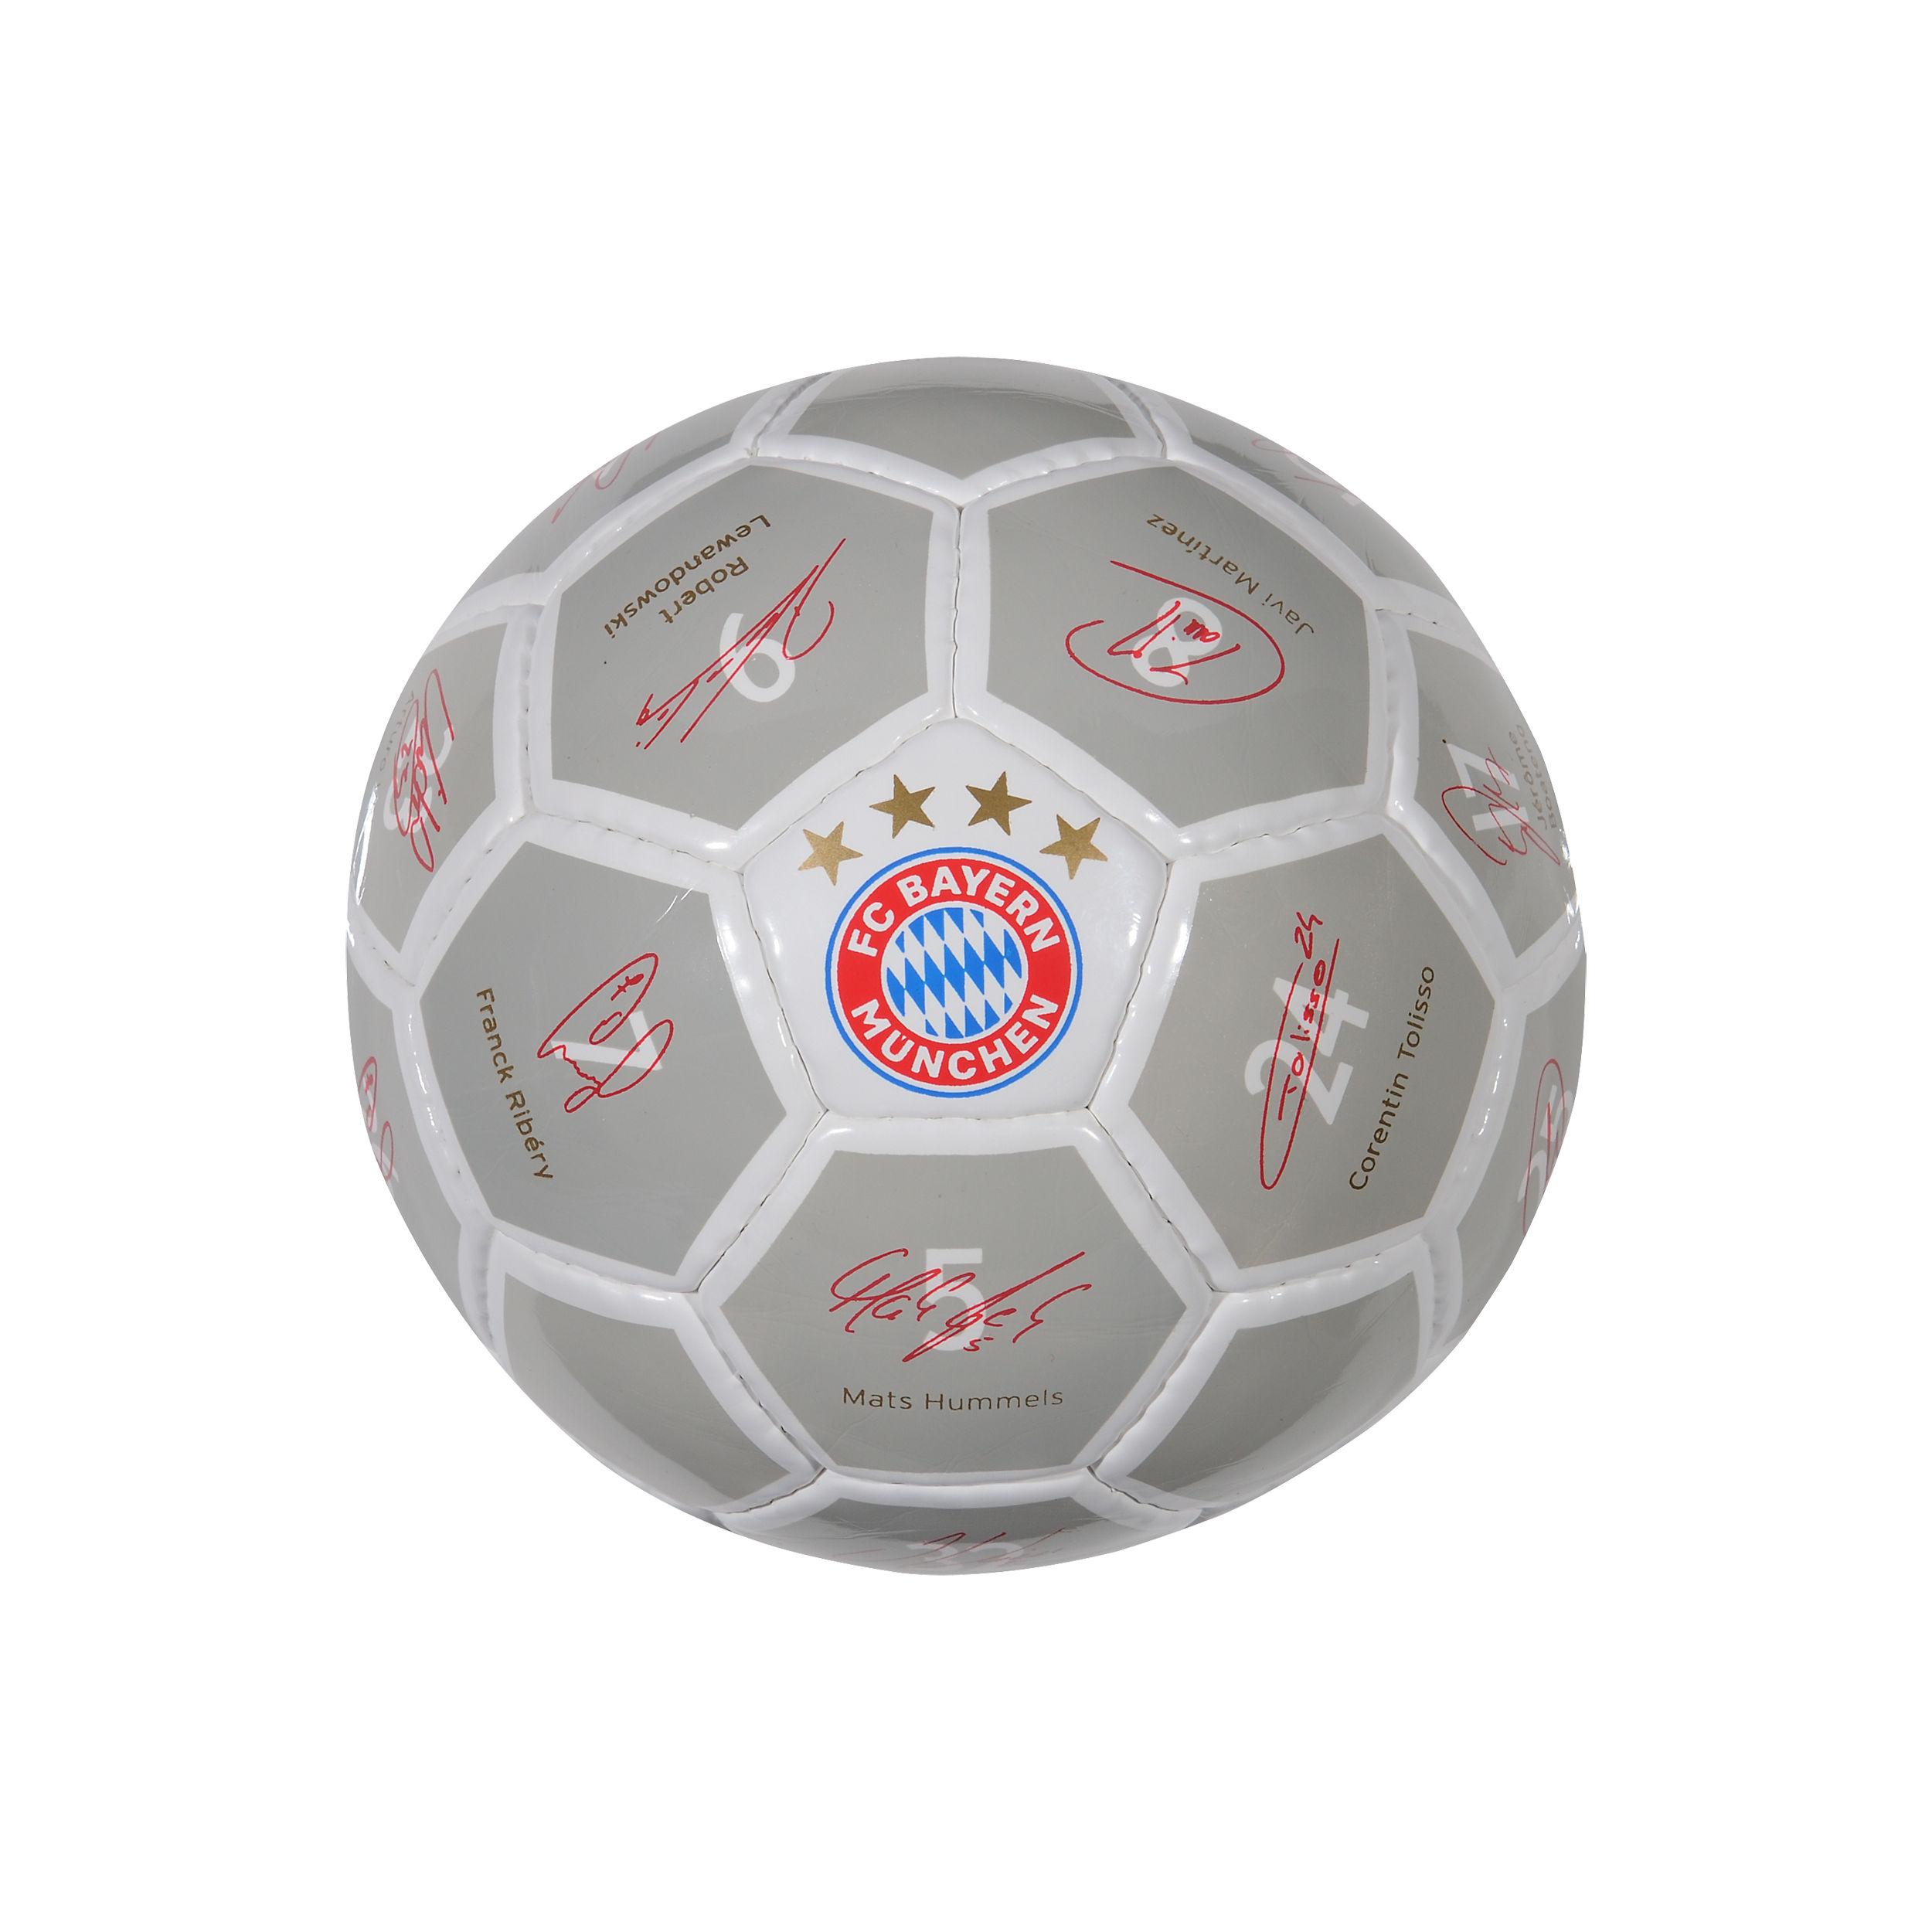 Signature Mini Ball 2017/18